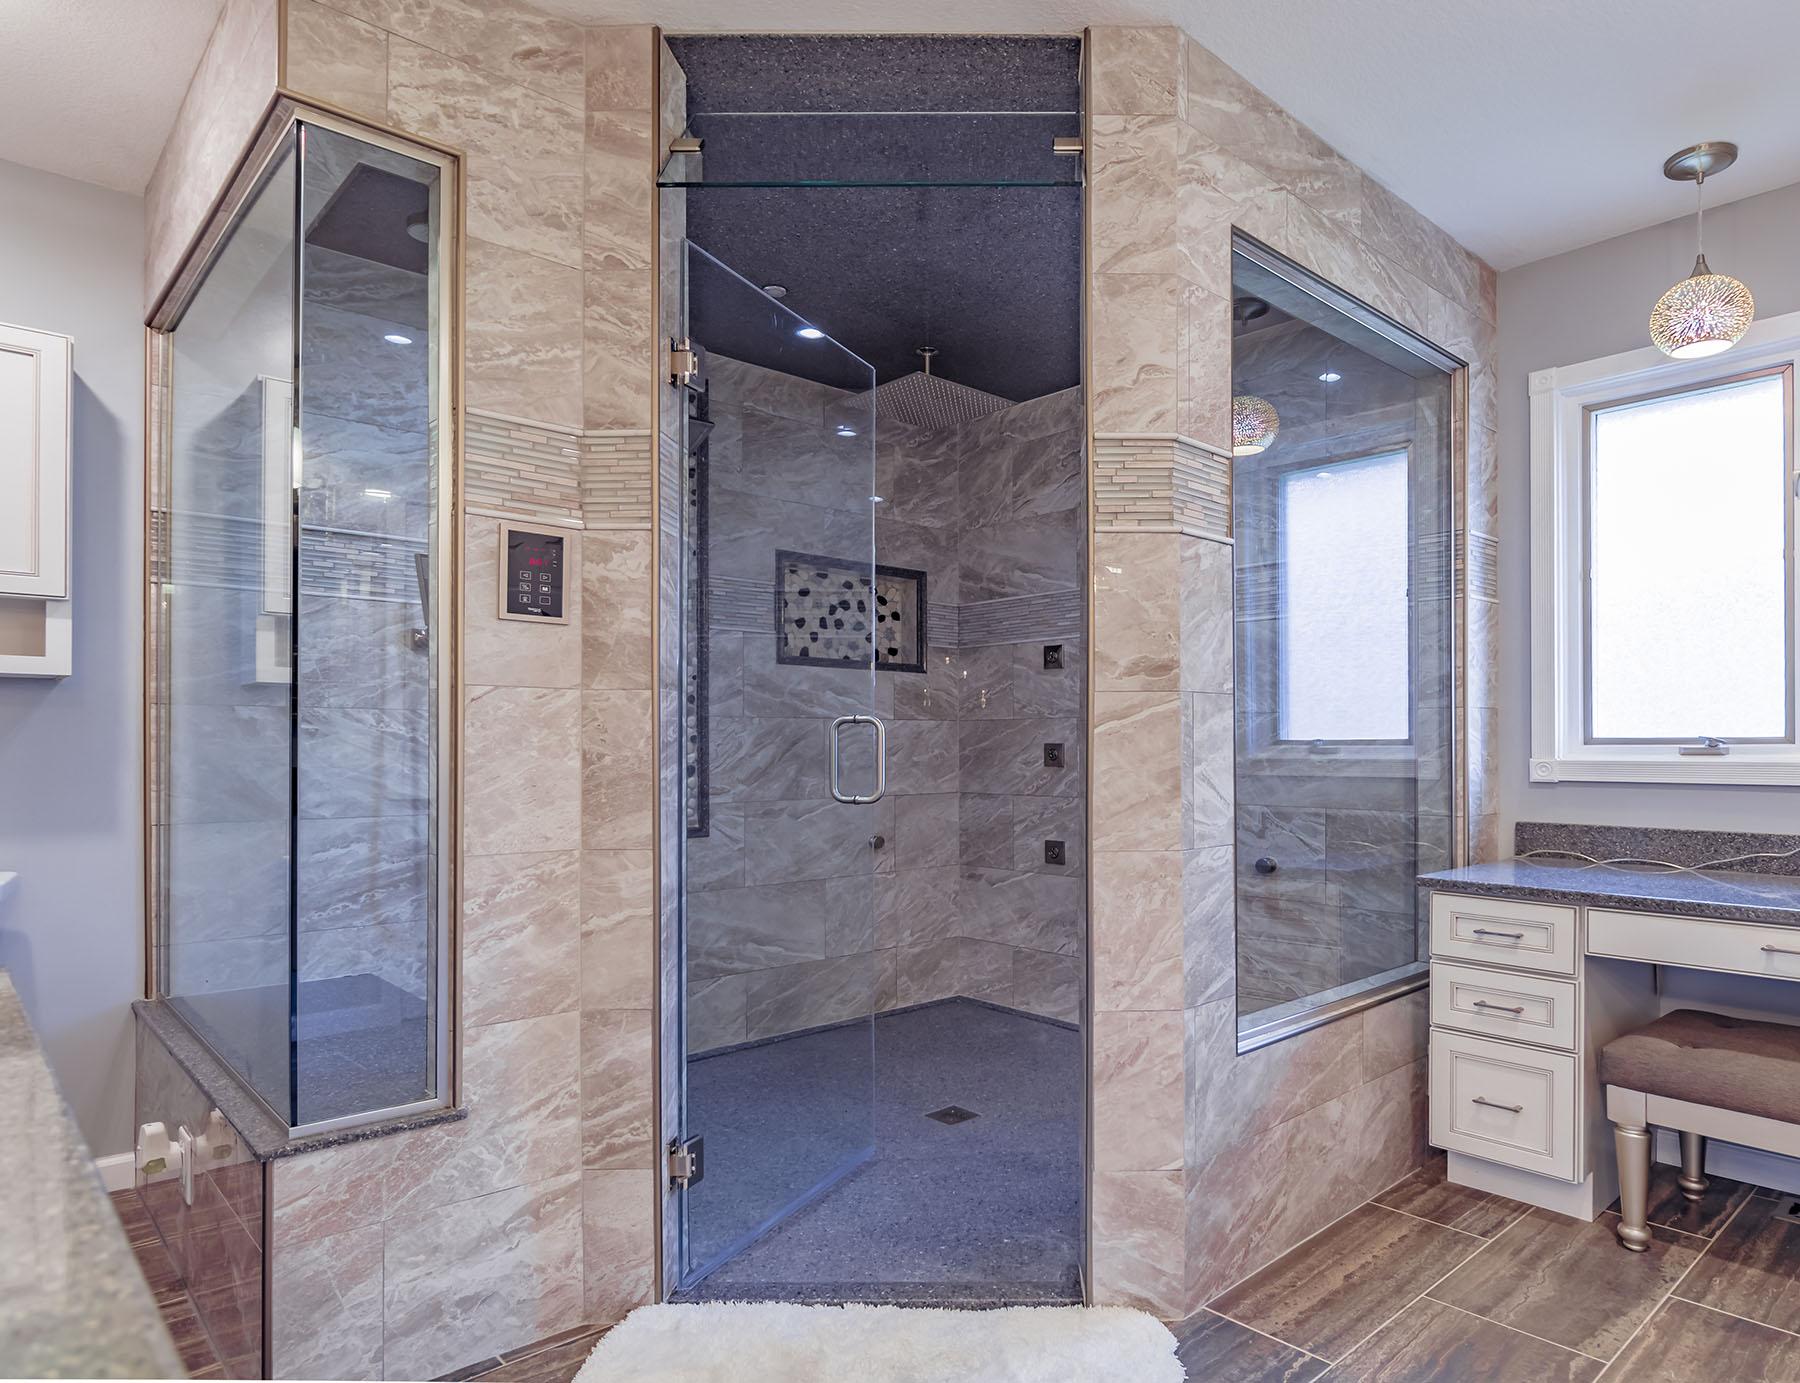 Austin Bathroom Remodel - 1 Day Bath of Texas Onyx Collection